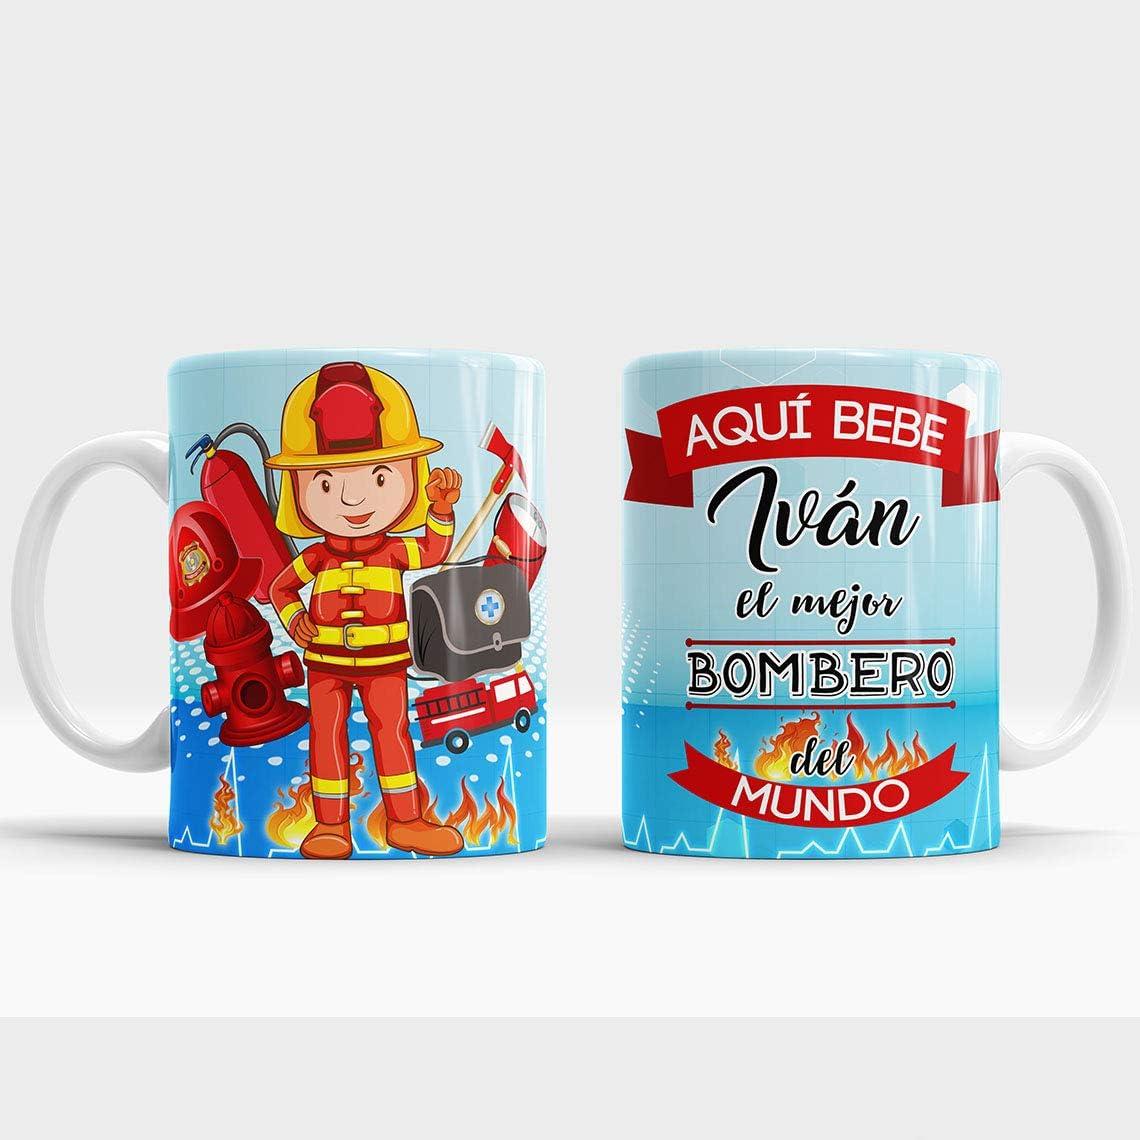 Taza Aquí Bebe el Mejor Bombero del Mundo/Taza aqui Bebe un Super Bombero/Taza Personalizada con Nombre/Taza Regalo Original para Bombero (Bombero)